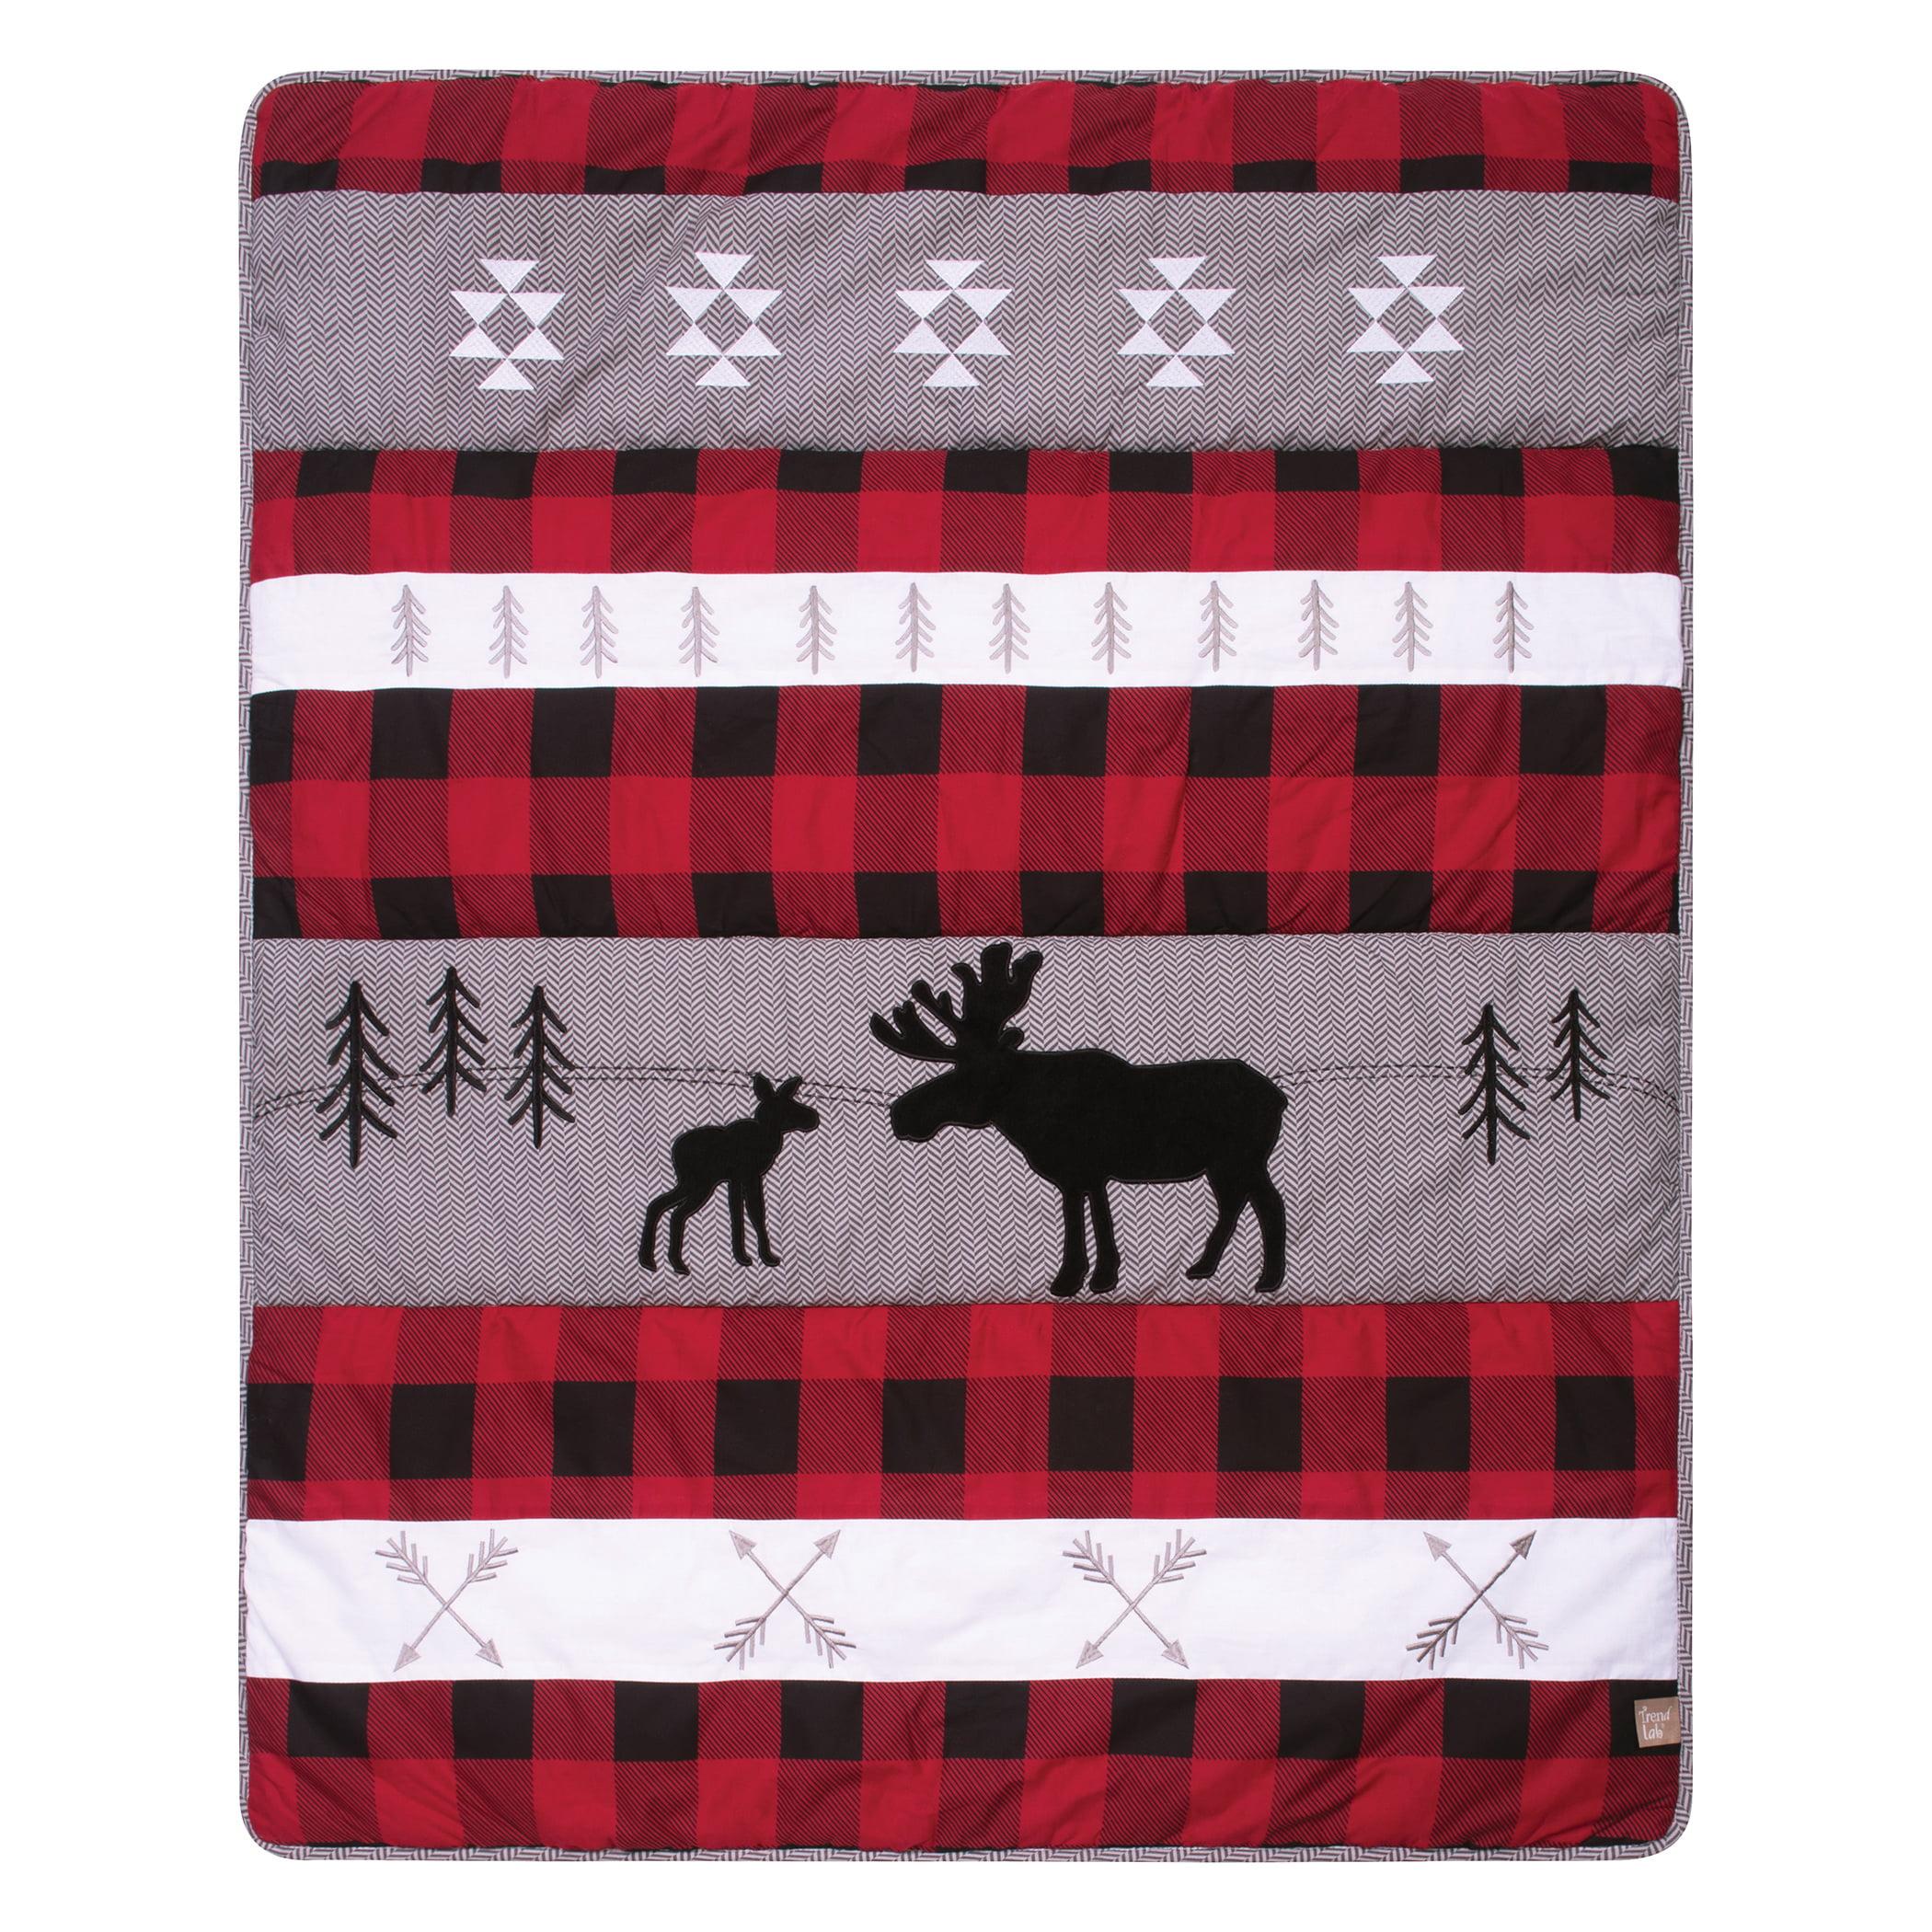 Lumberjack Moose 3 Piece Crib Bedding Set Multi Color Animal Print Neutral Animals Cotton